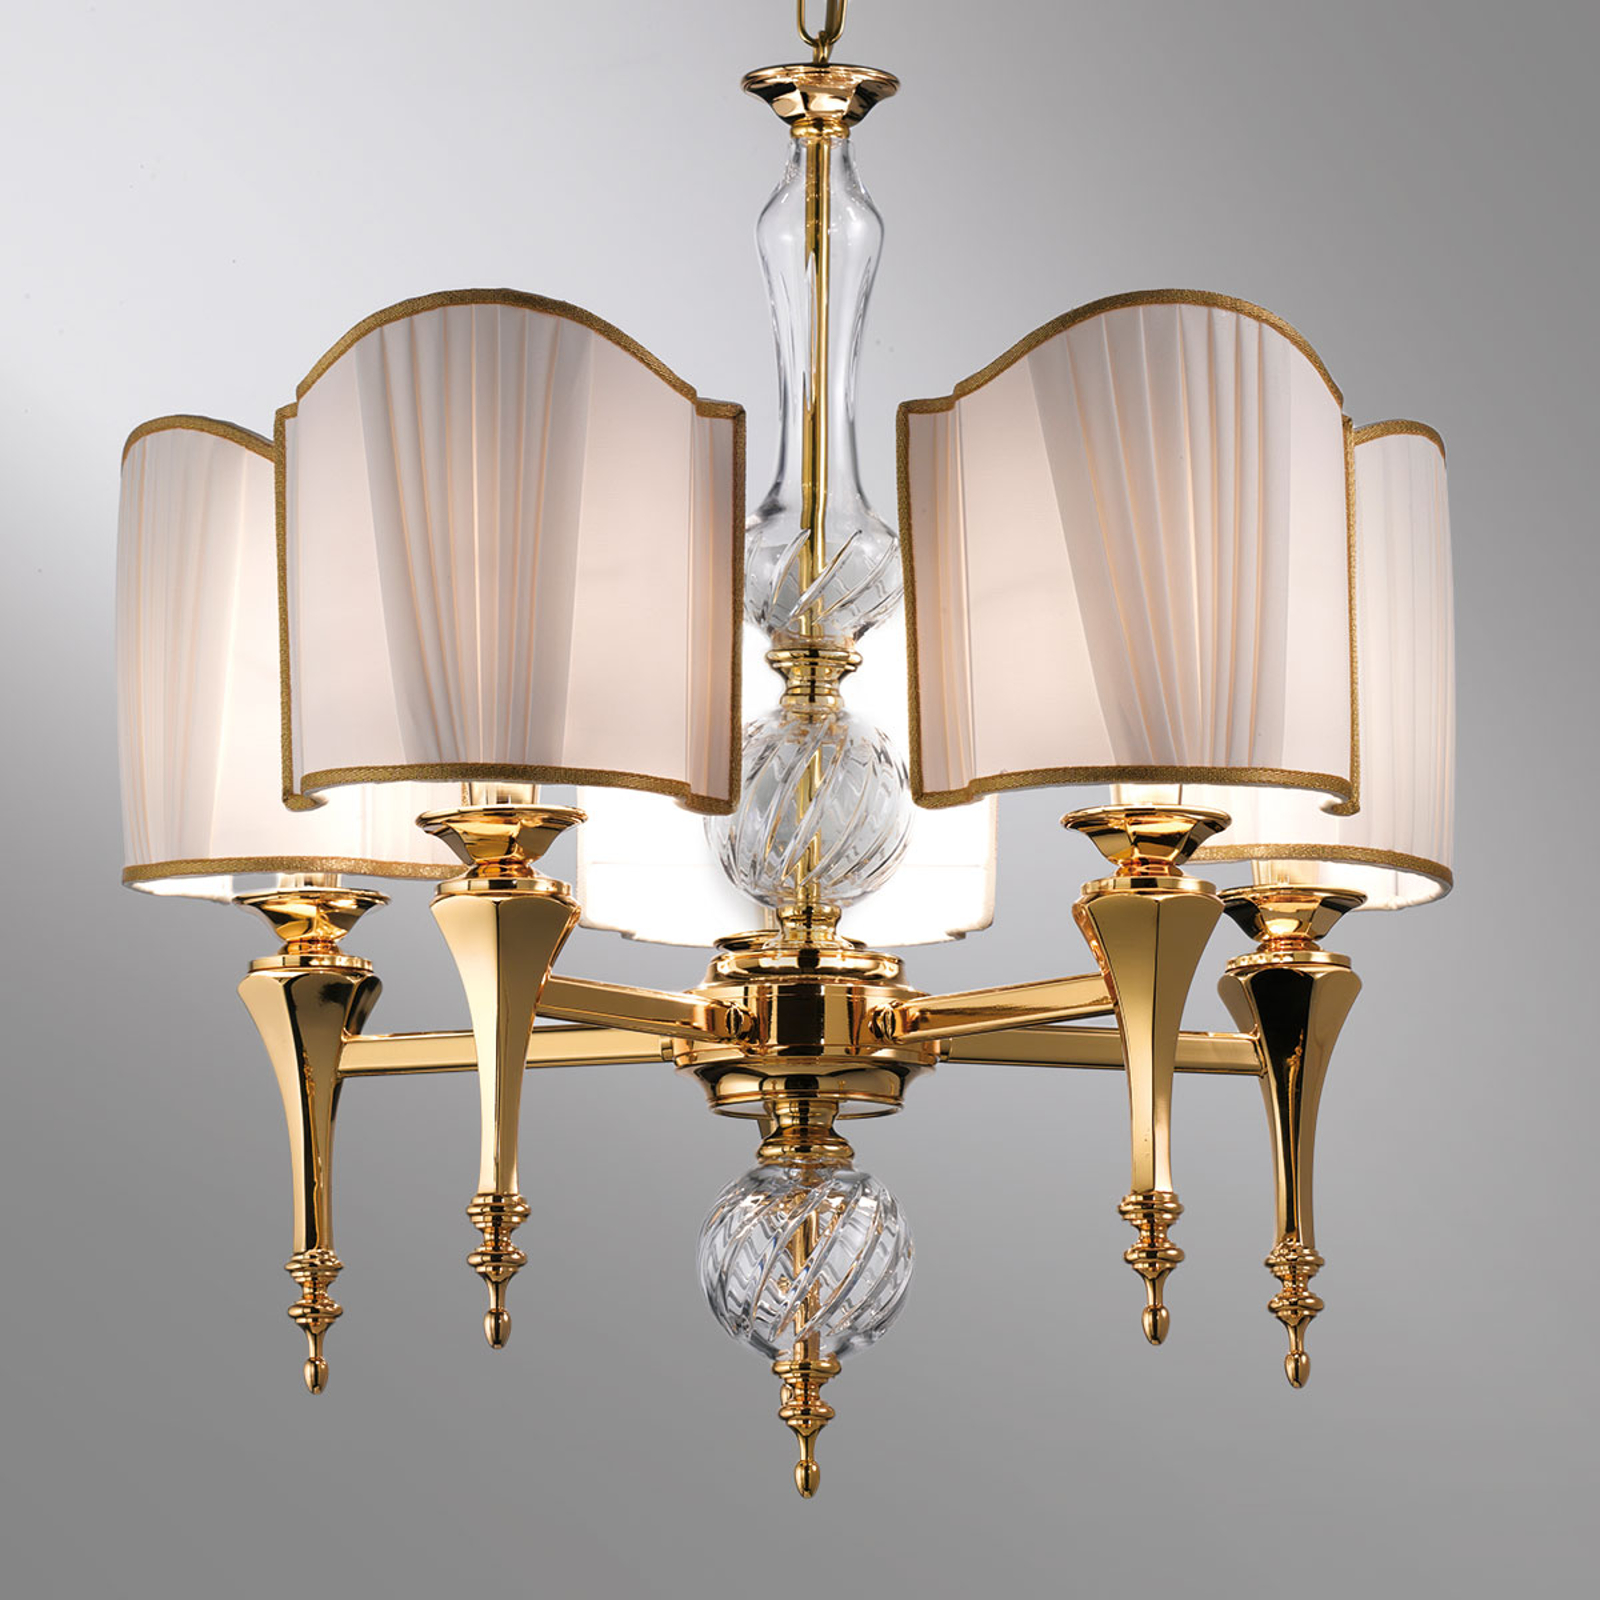 Belle Epoque - lampada a sospensione 5 luci